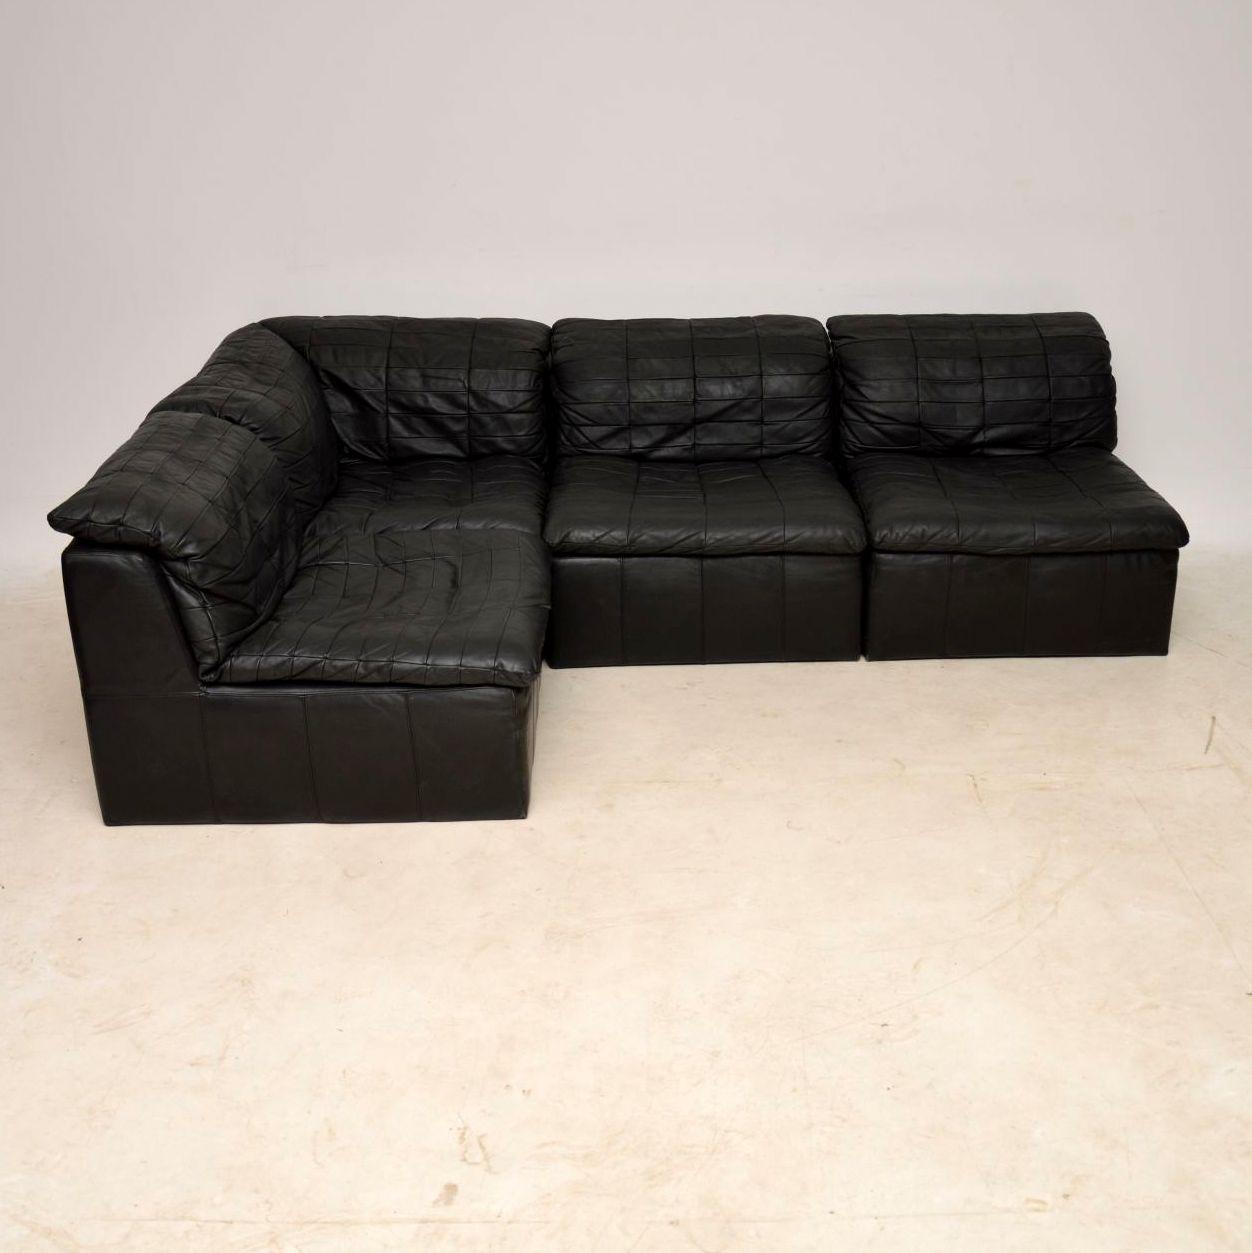 Black Leather Corner Sofa Ebay: DANISH RETRO LEATHER MODULAR CORNER SOFA VINTAGE 1960's